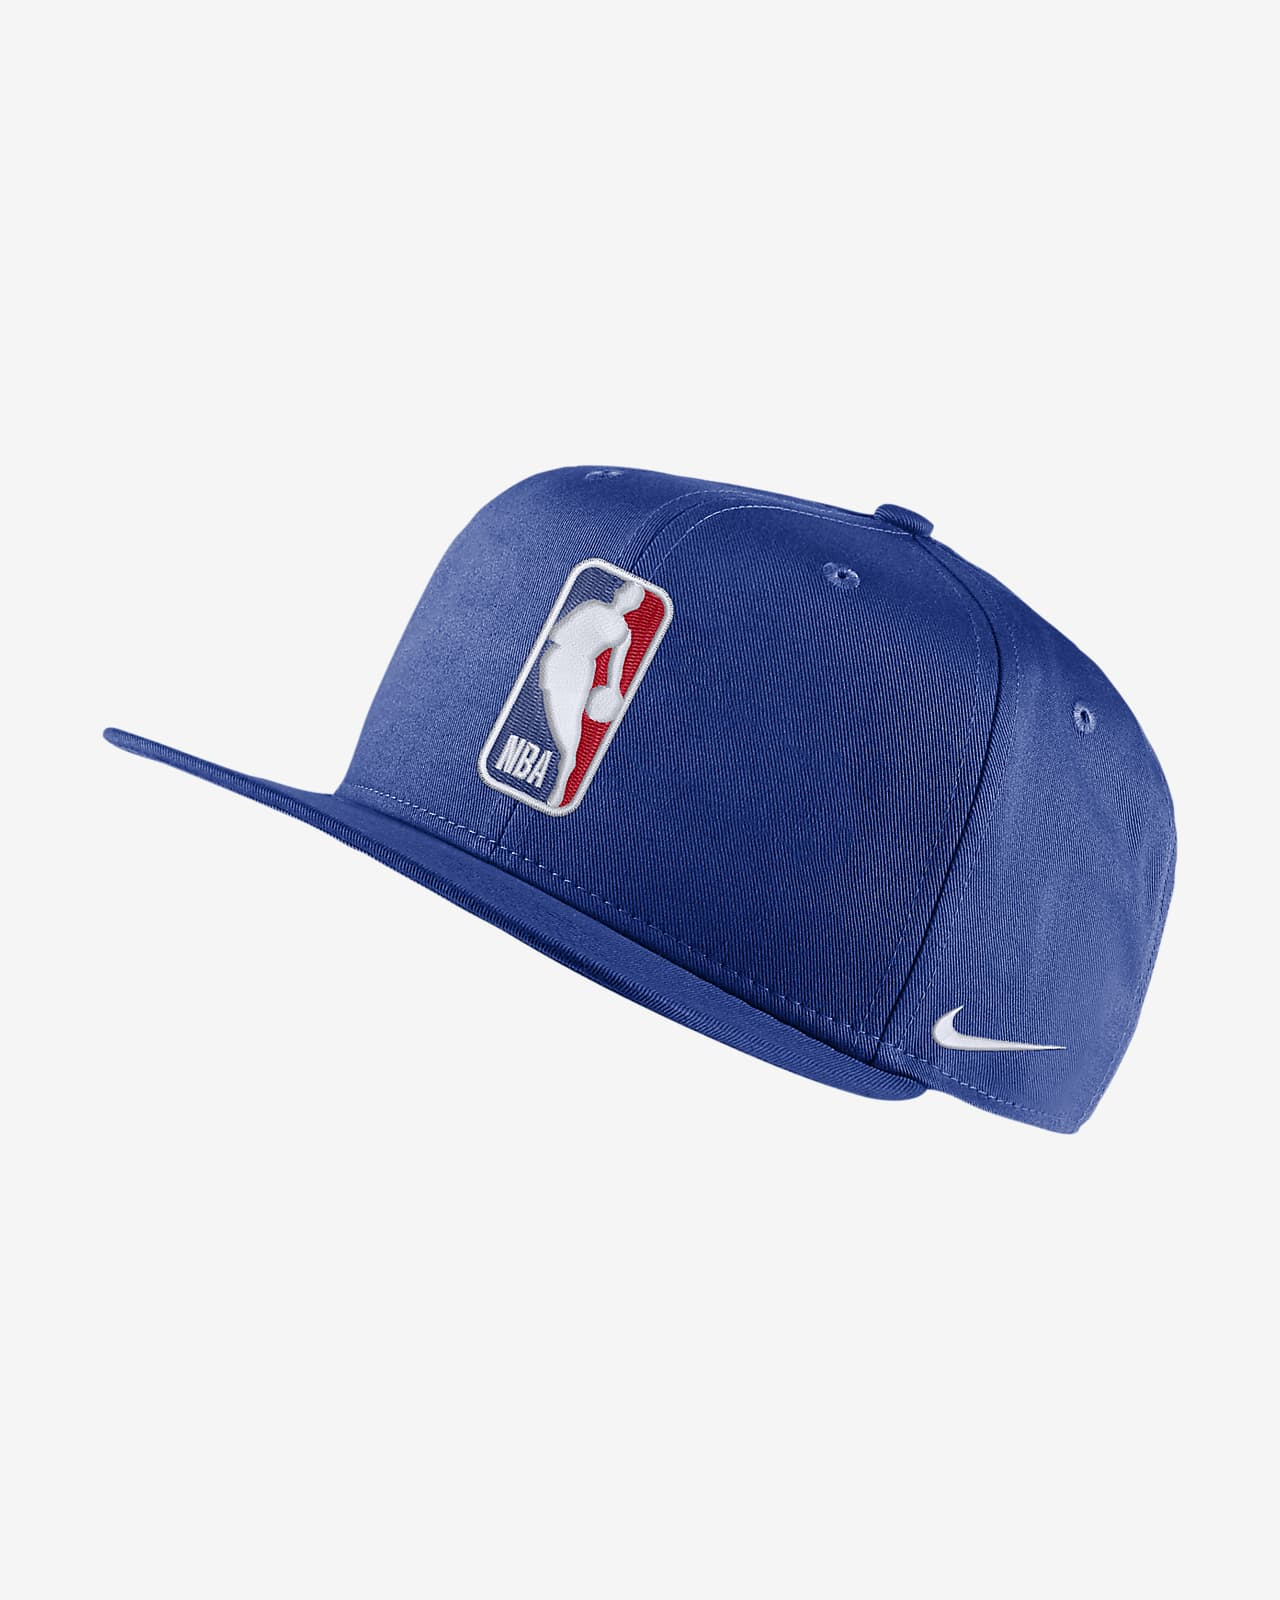 Team 31 Logo Nike Pro NBA Adjustable Cap